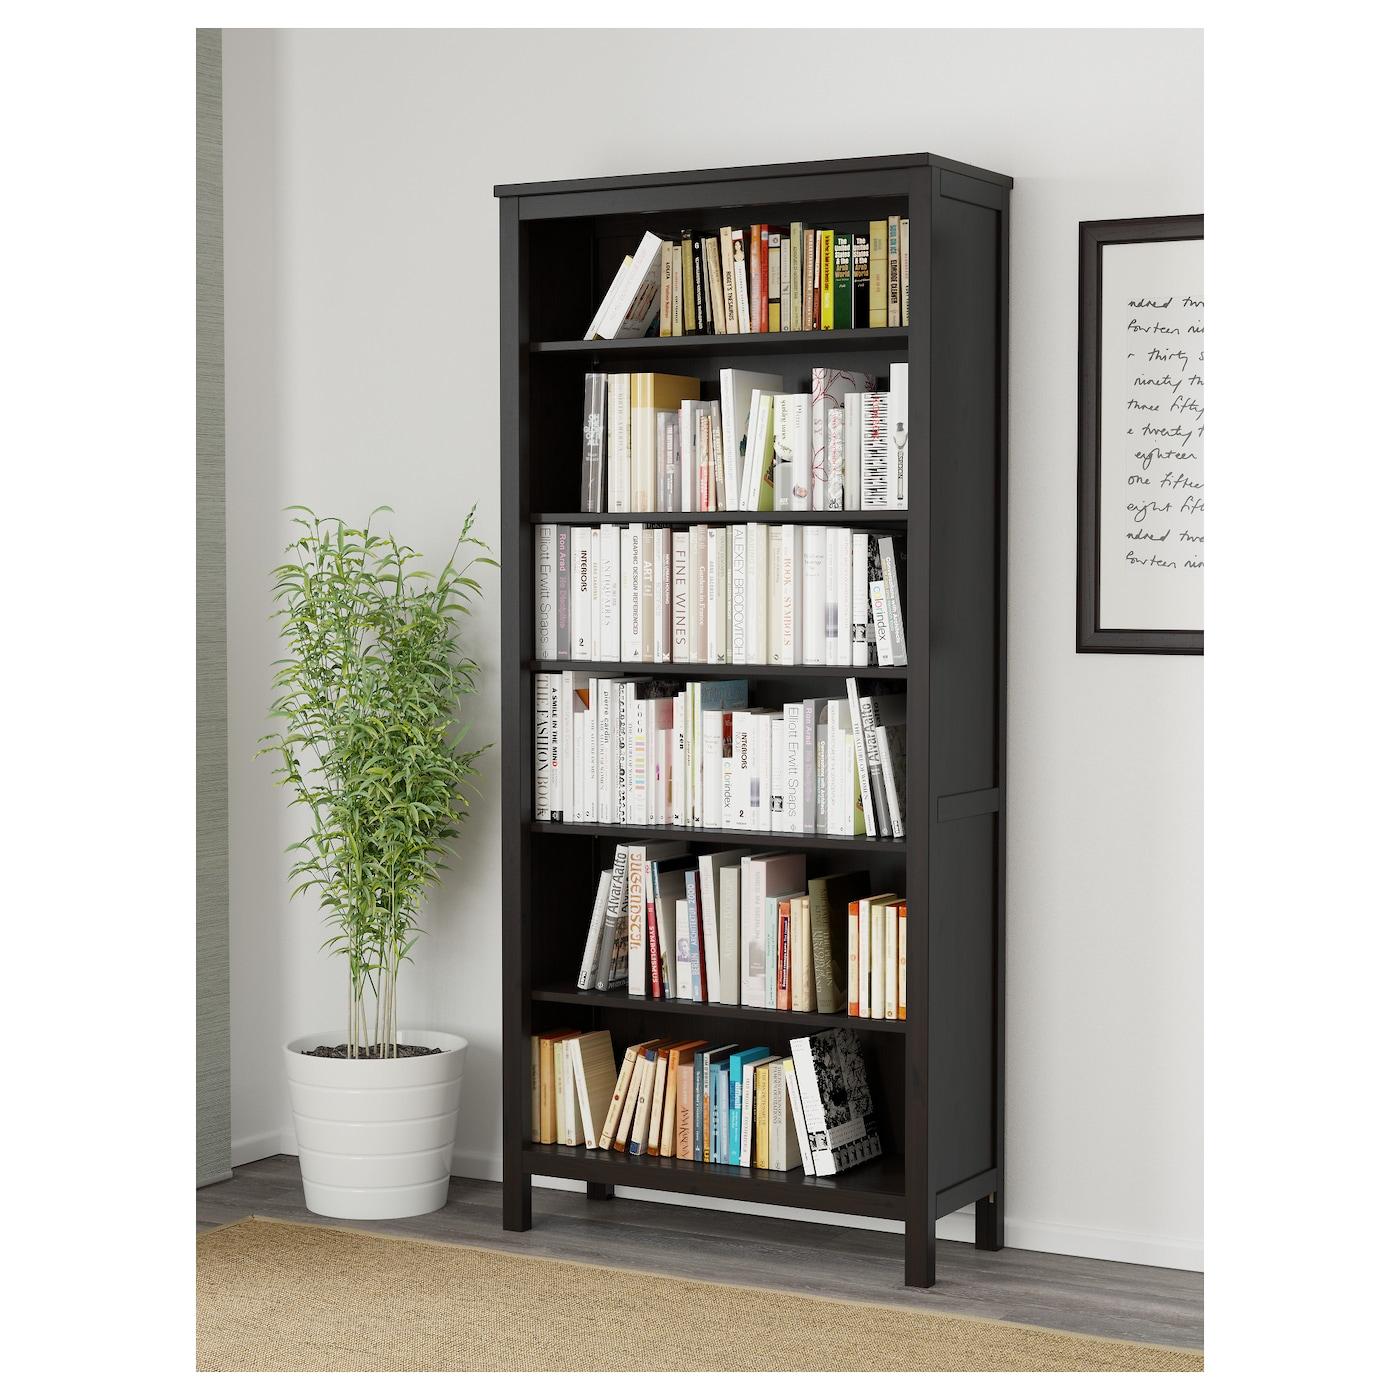 ikea bookcase image